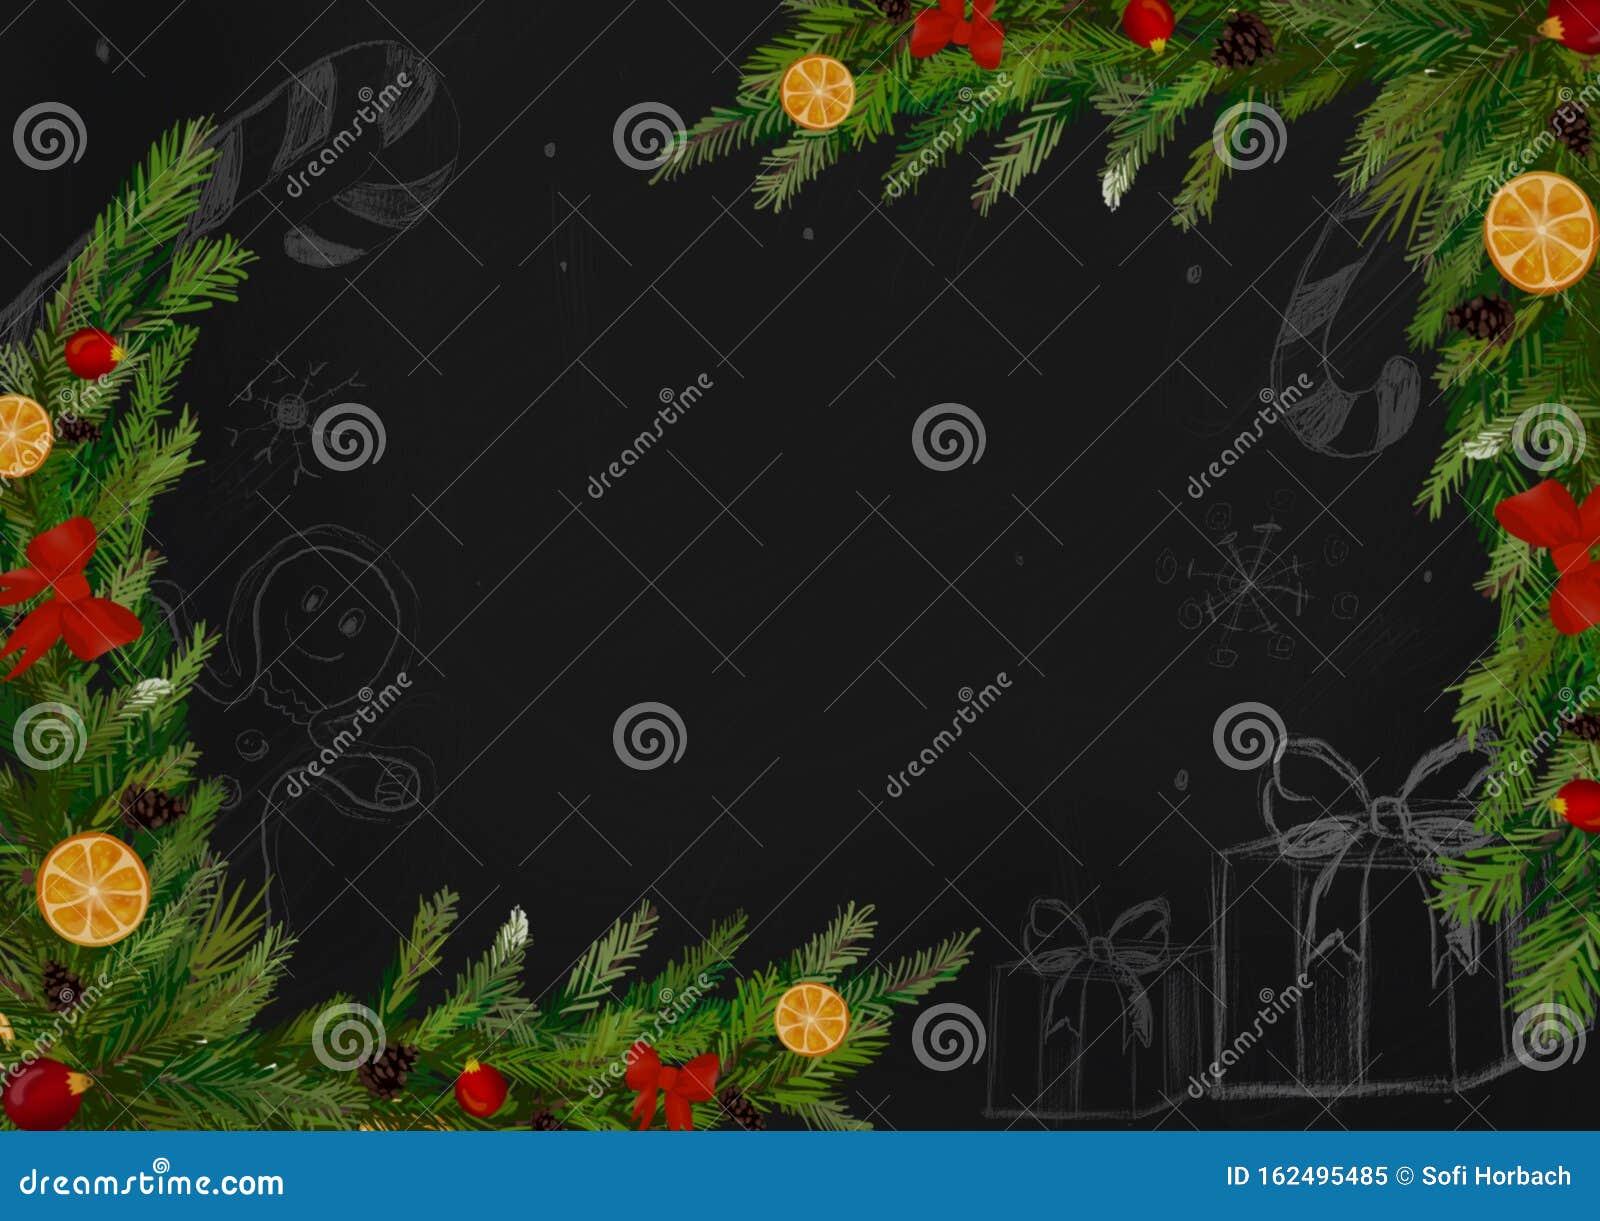 winter christmas wallpaper background design christmas tree orange winter christmas wallpaper background design 162495485